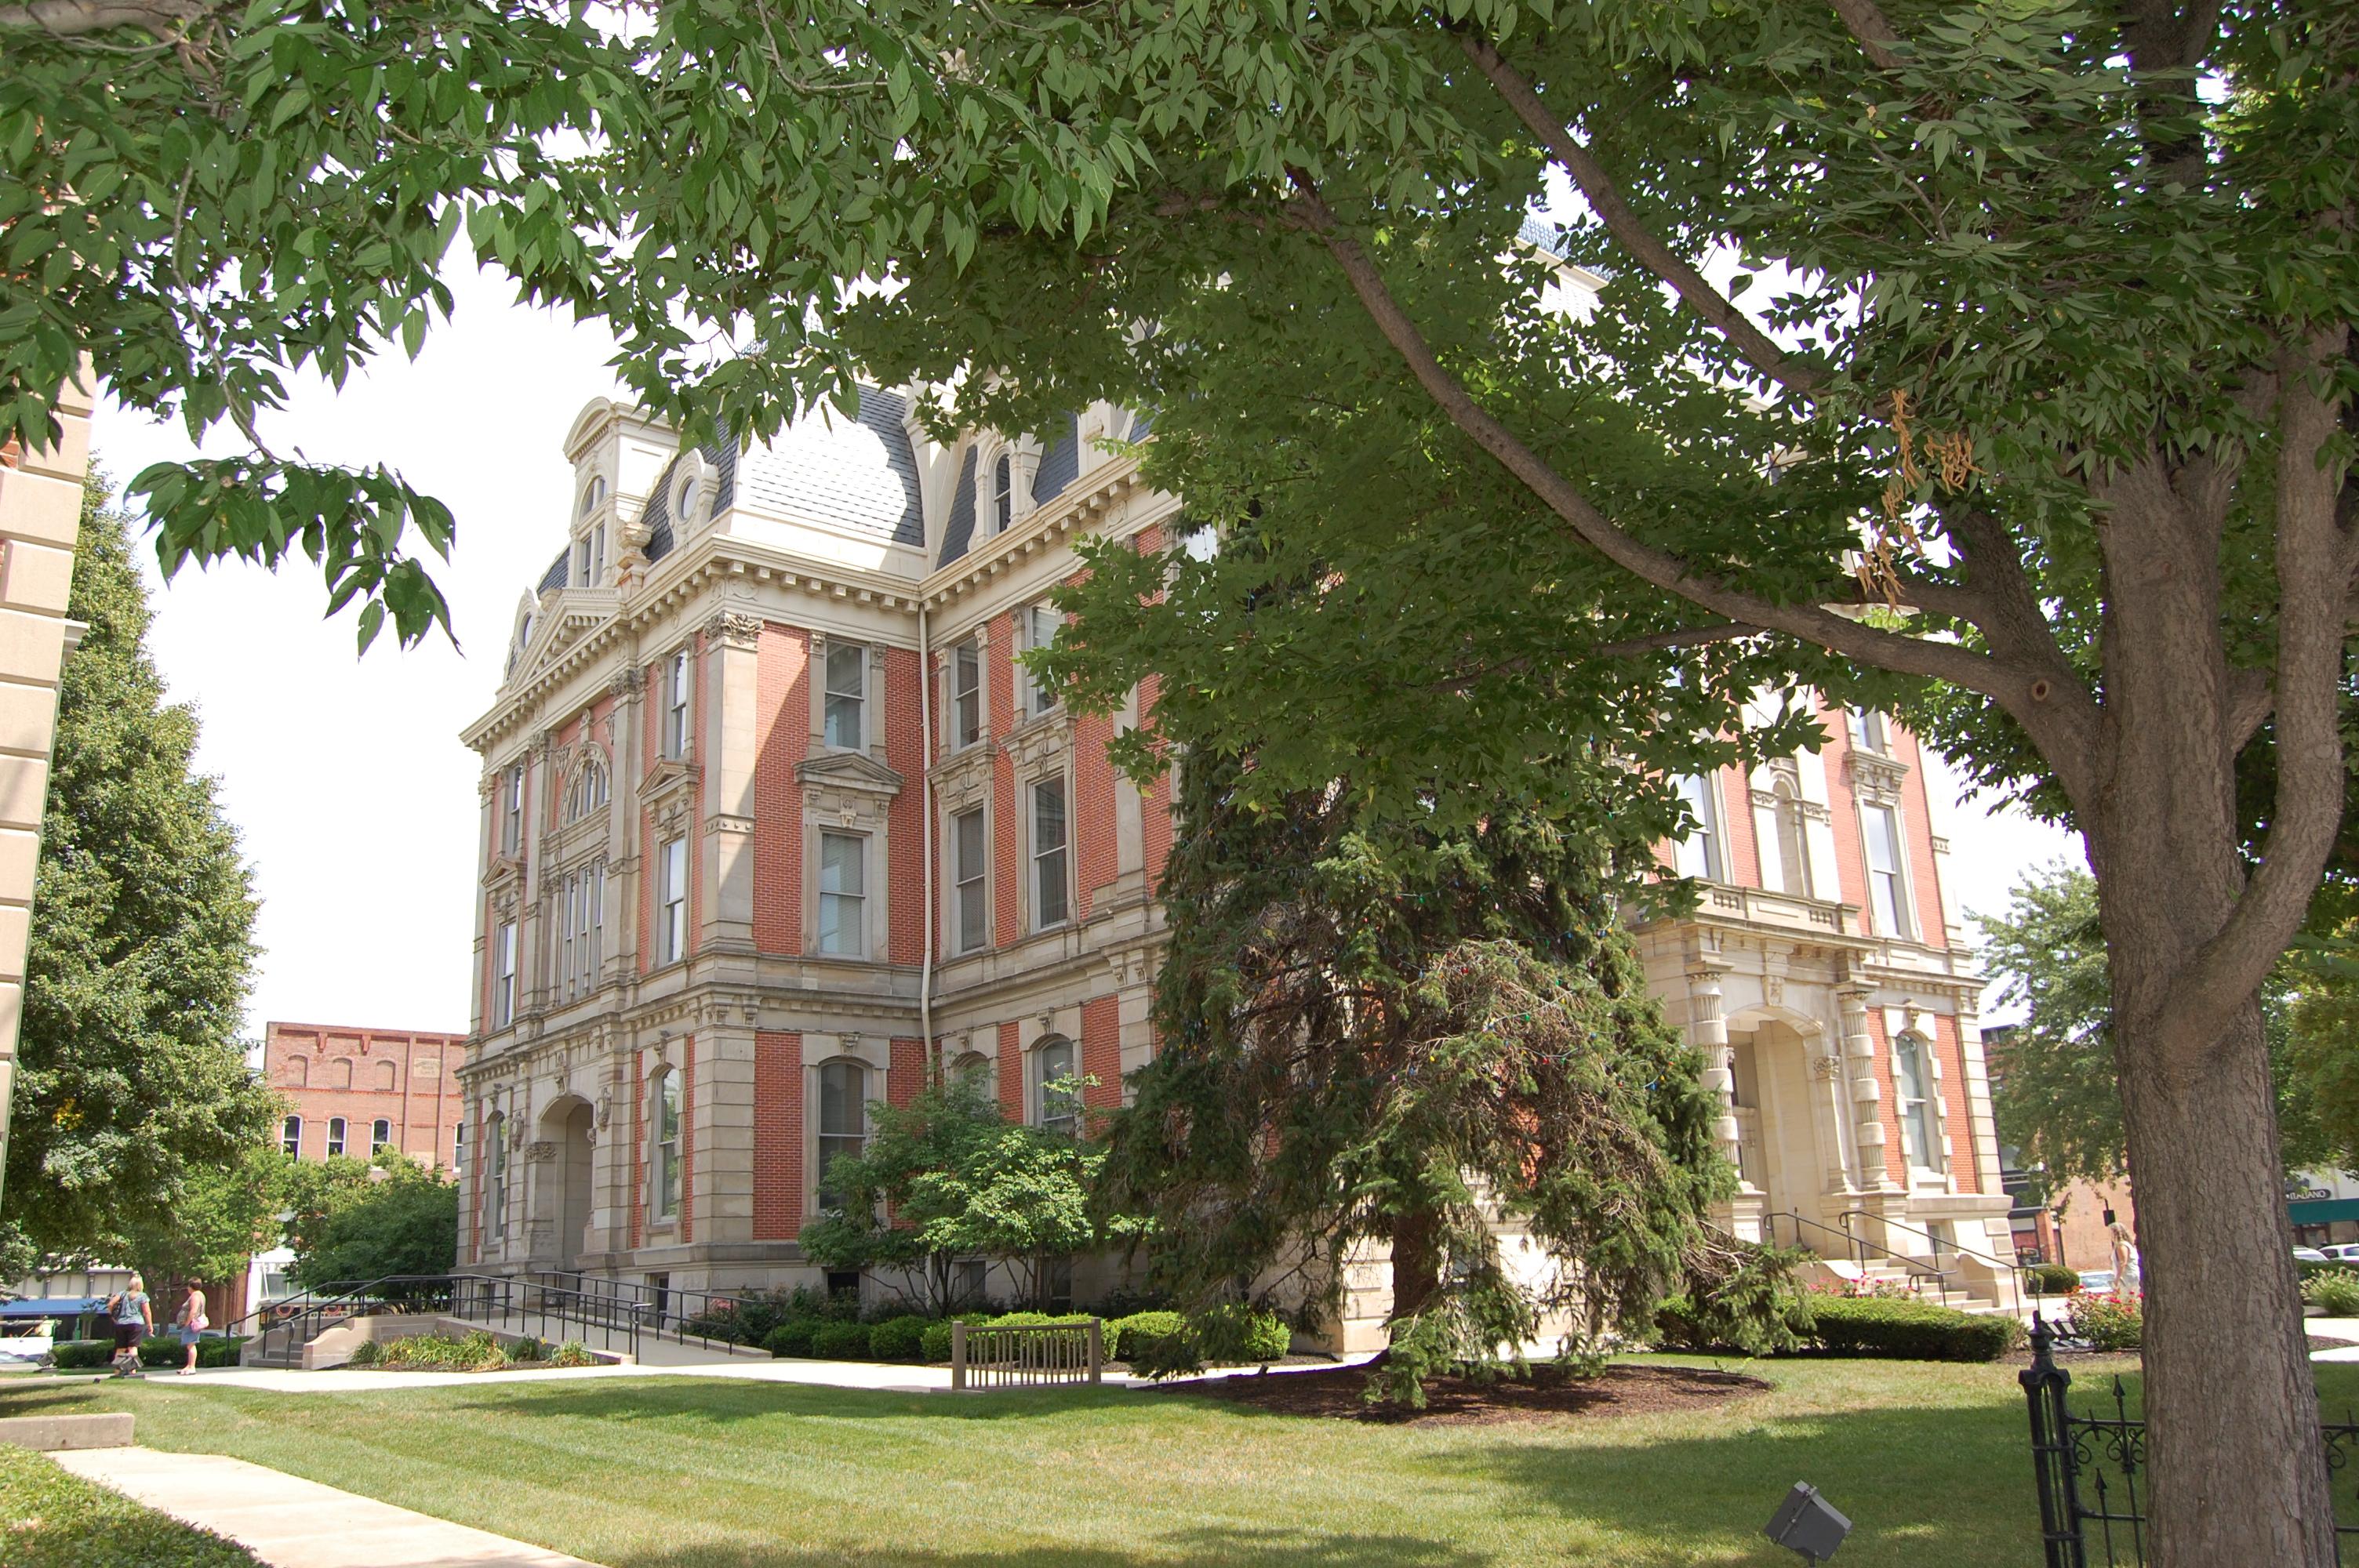 Hamilton County Court House